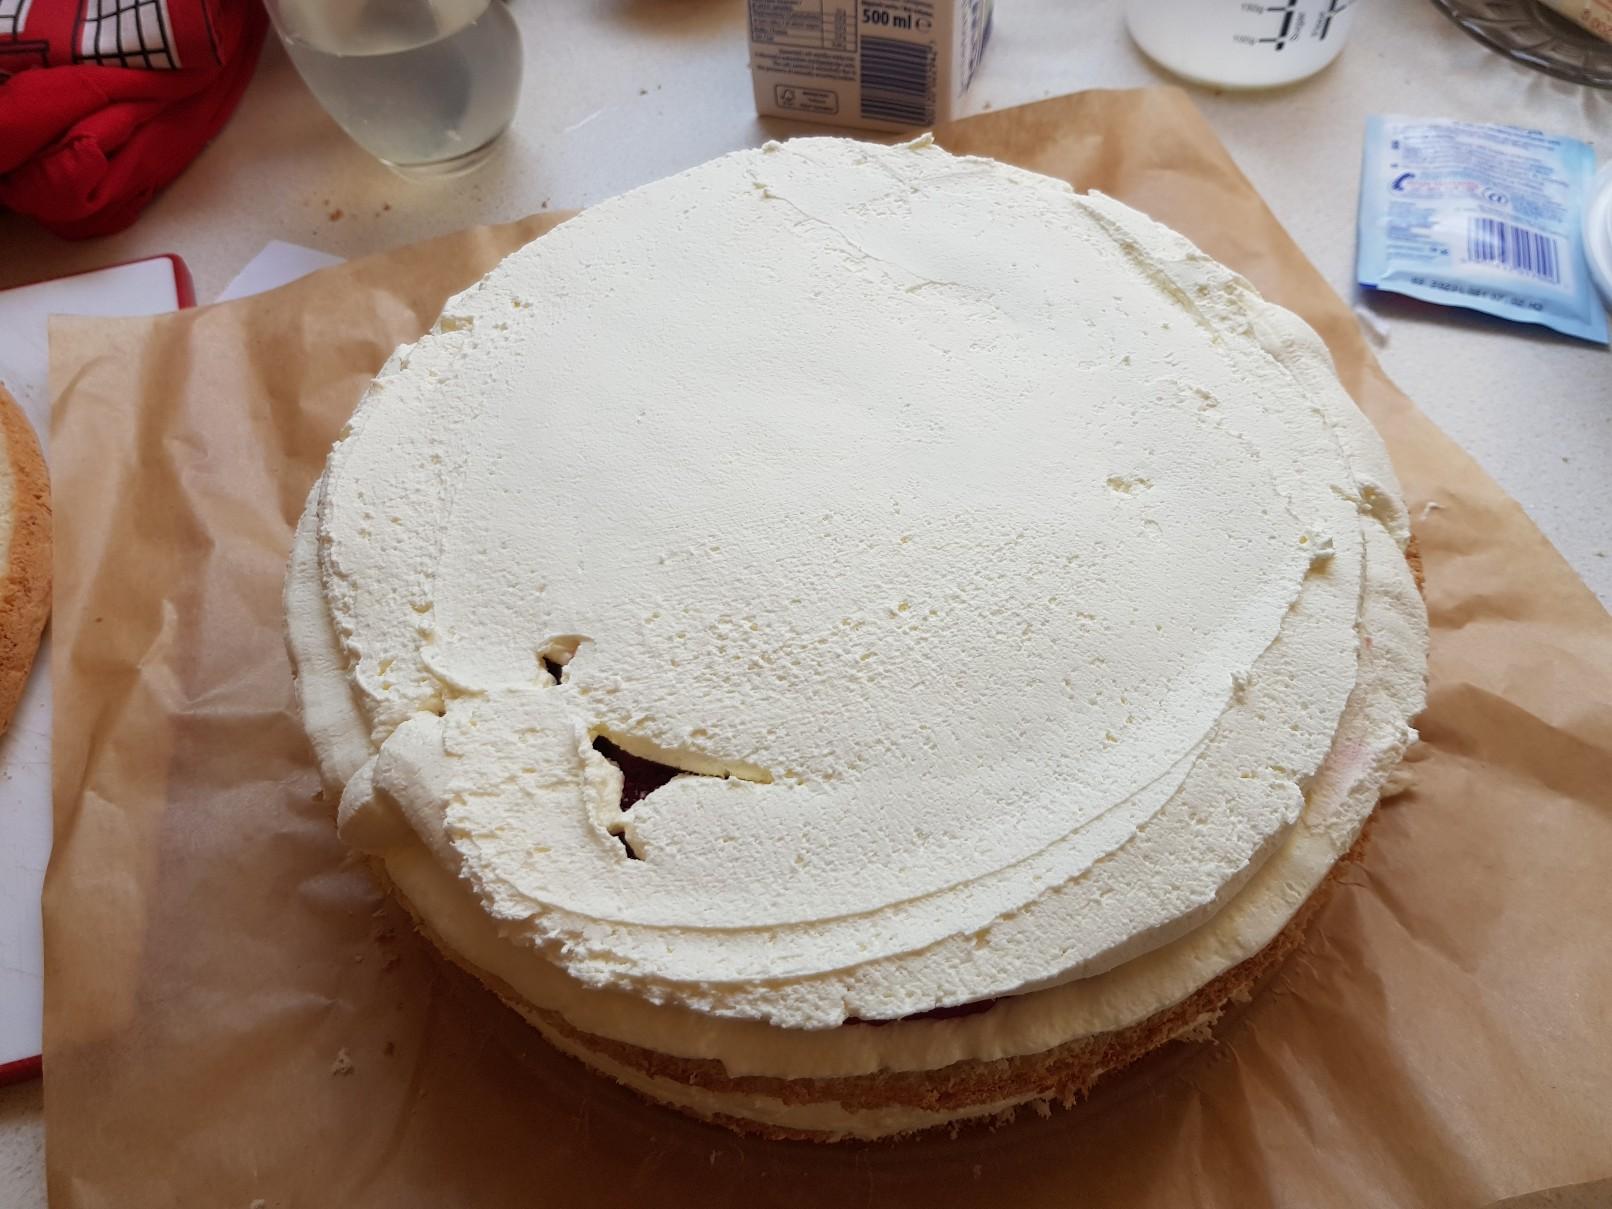 space birthday cake cream filling 2